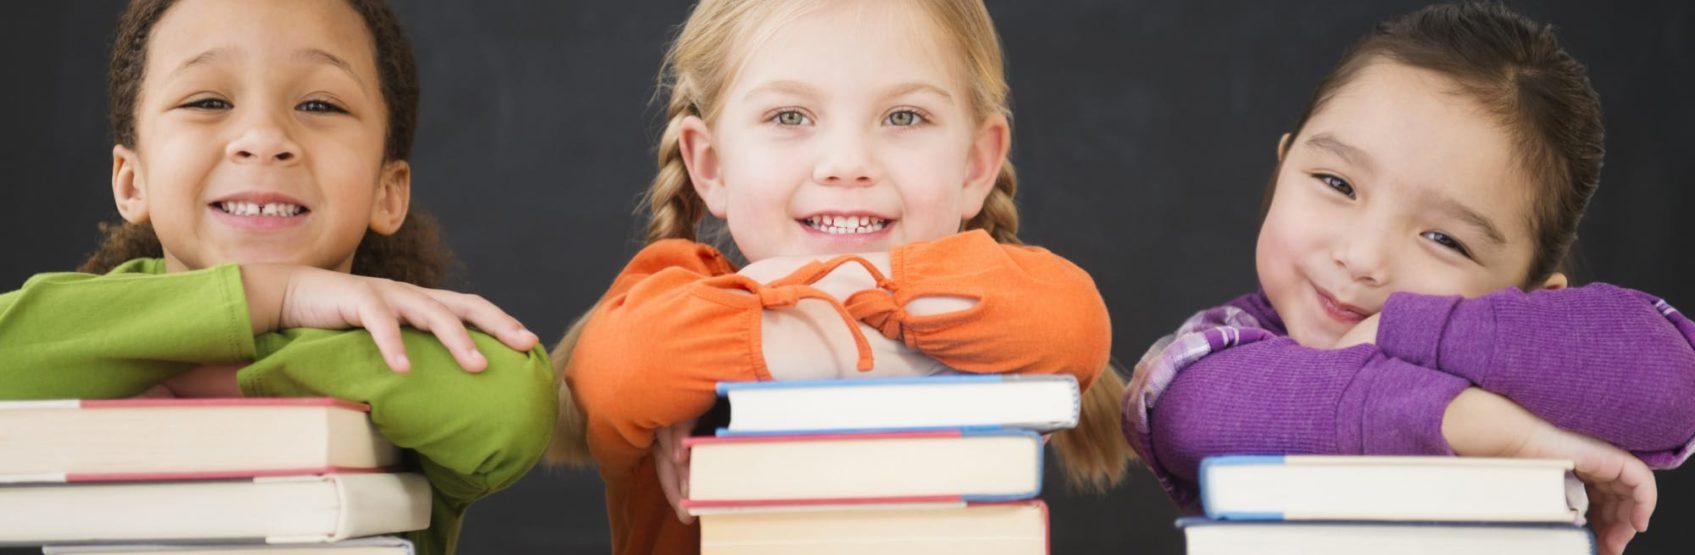 enfants livres